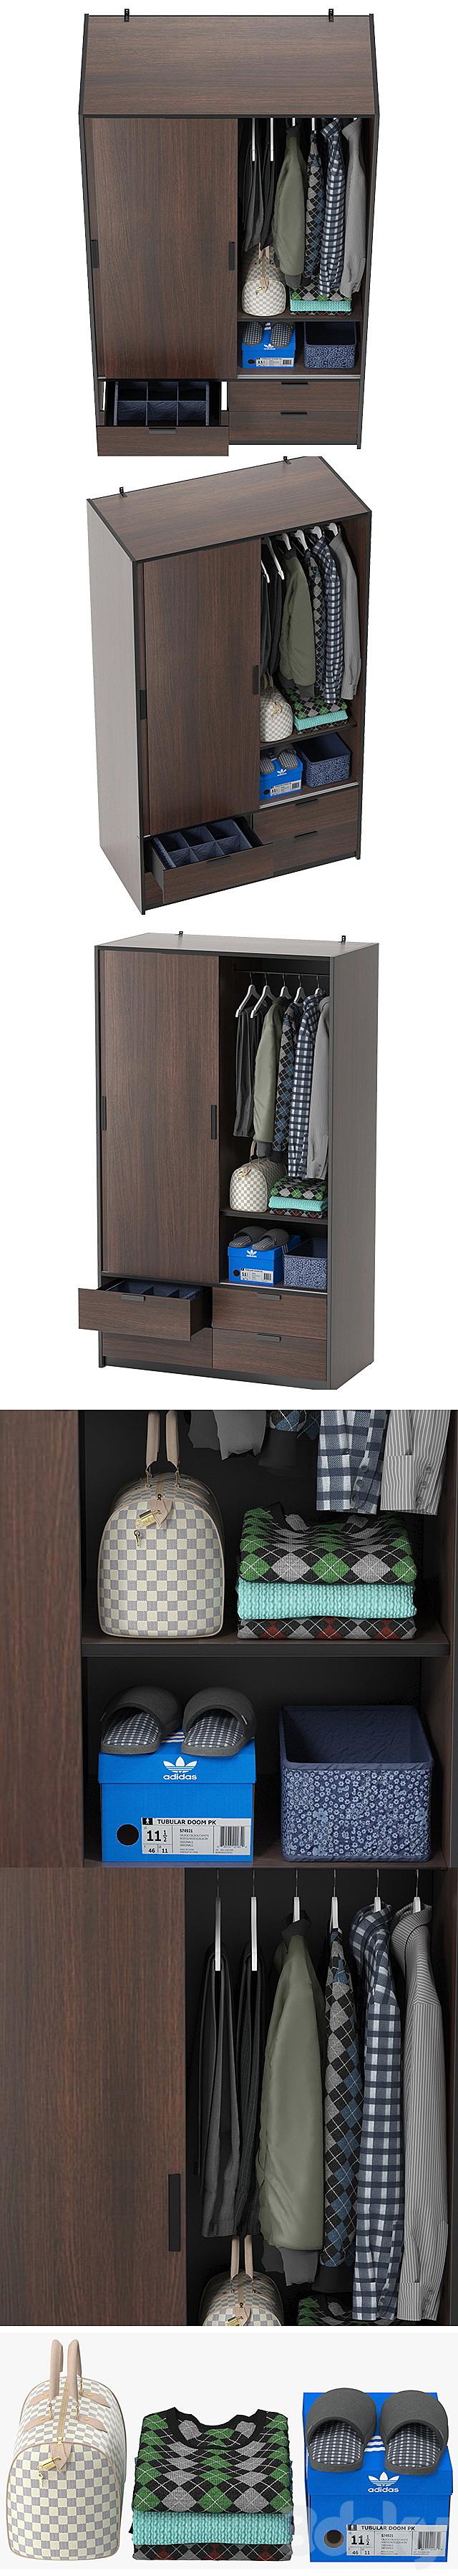 Ikea trysil